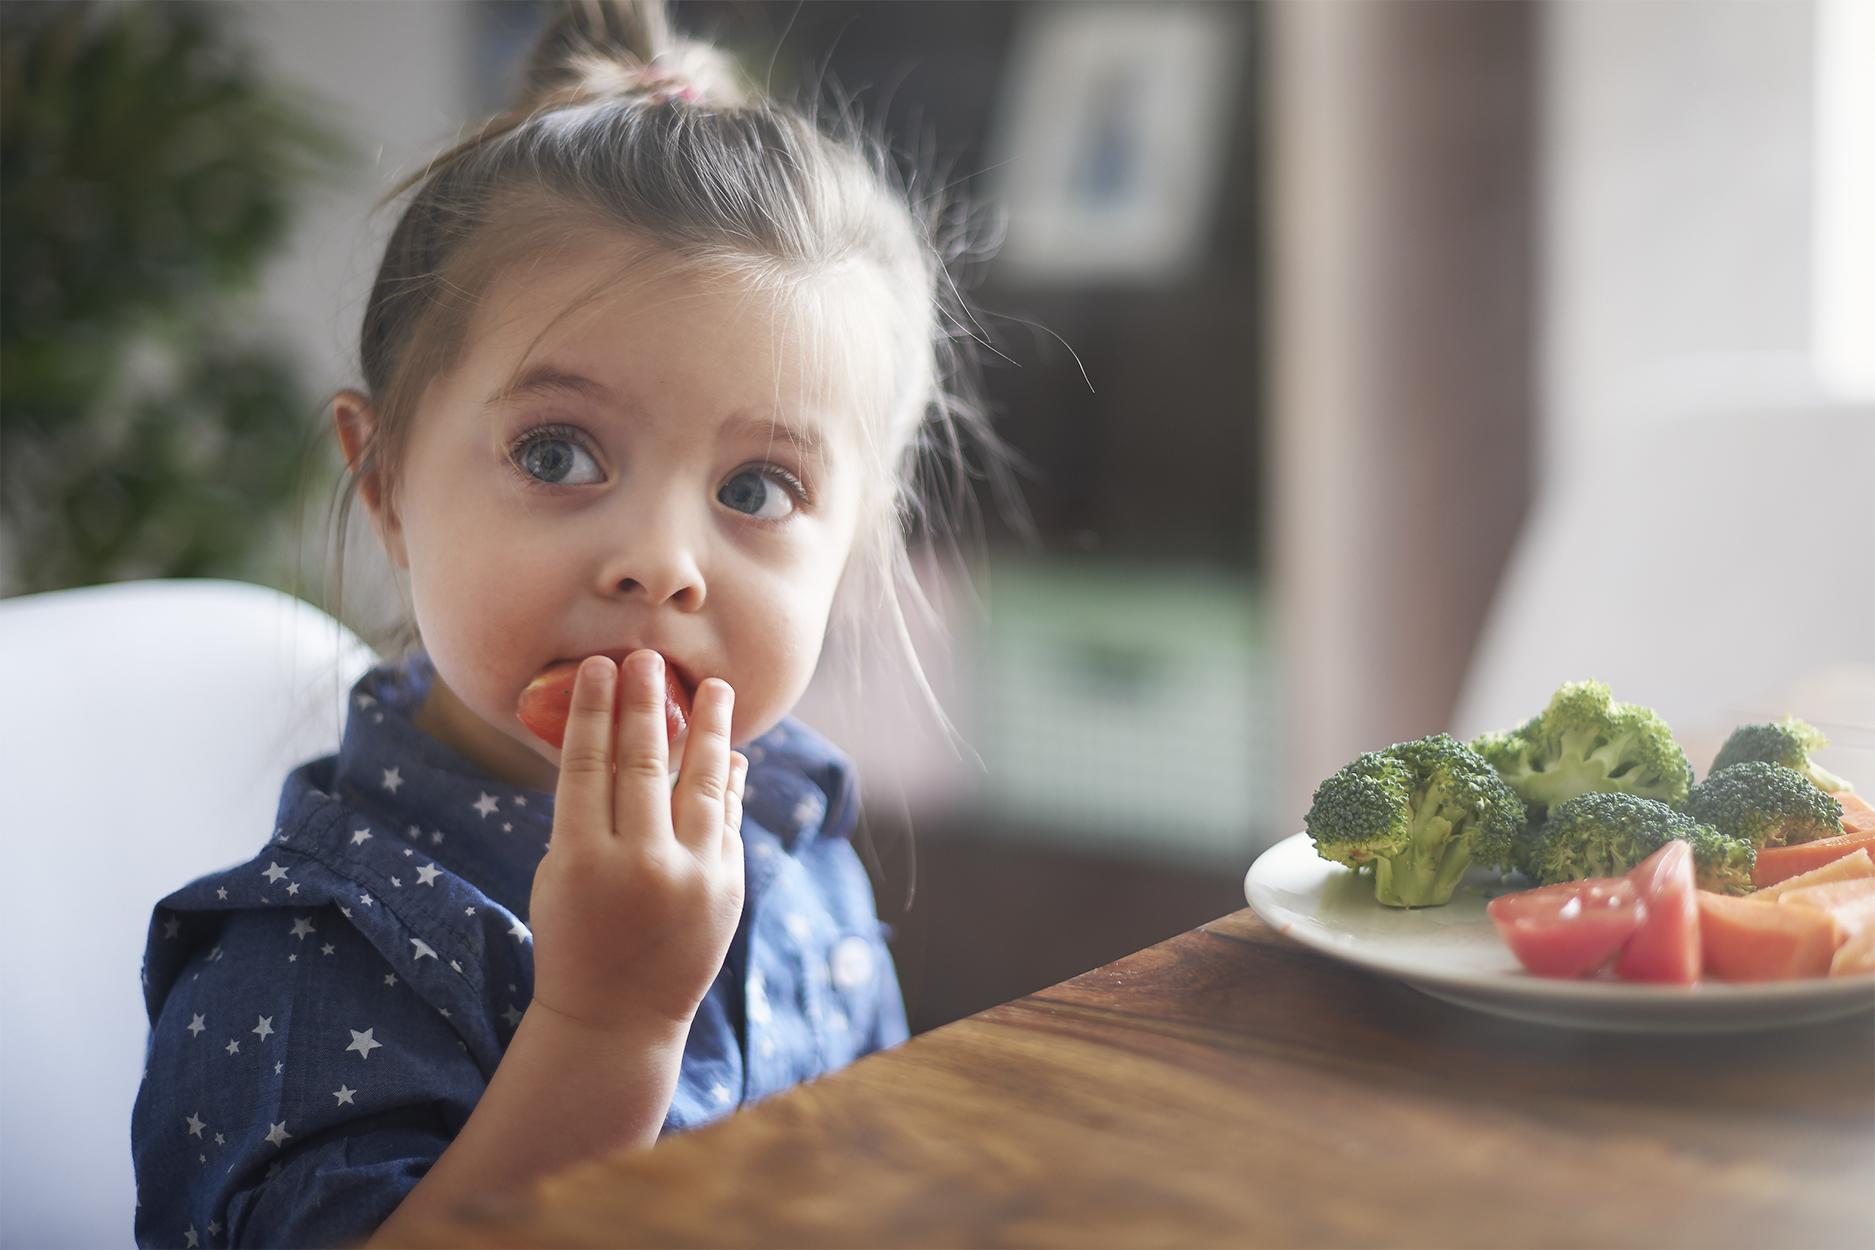 masticare lentamente, come un bambino